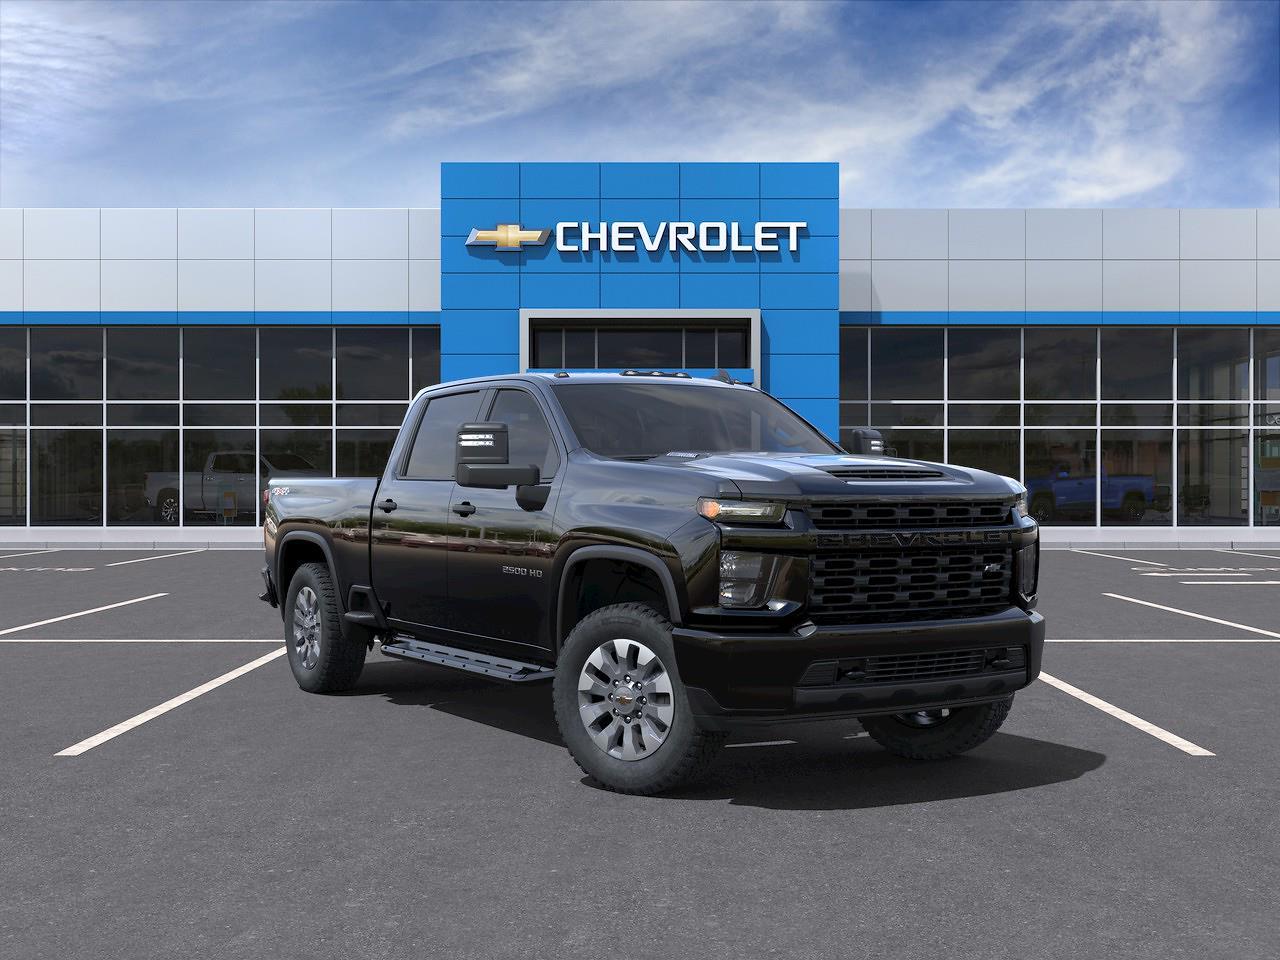 2021 Chevrolet Silverado 2500 Crew Cab 4x4, Pickup #Q210455 - photo 1